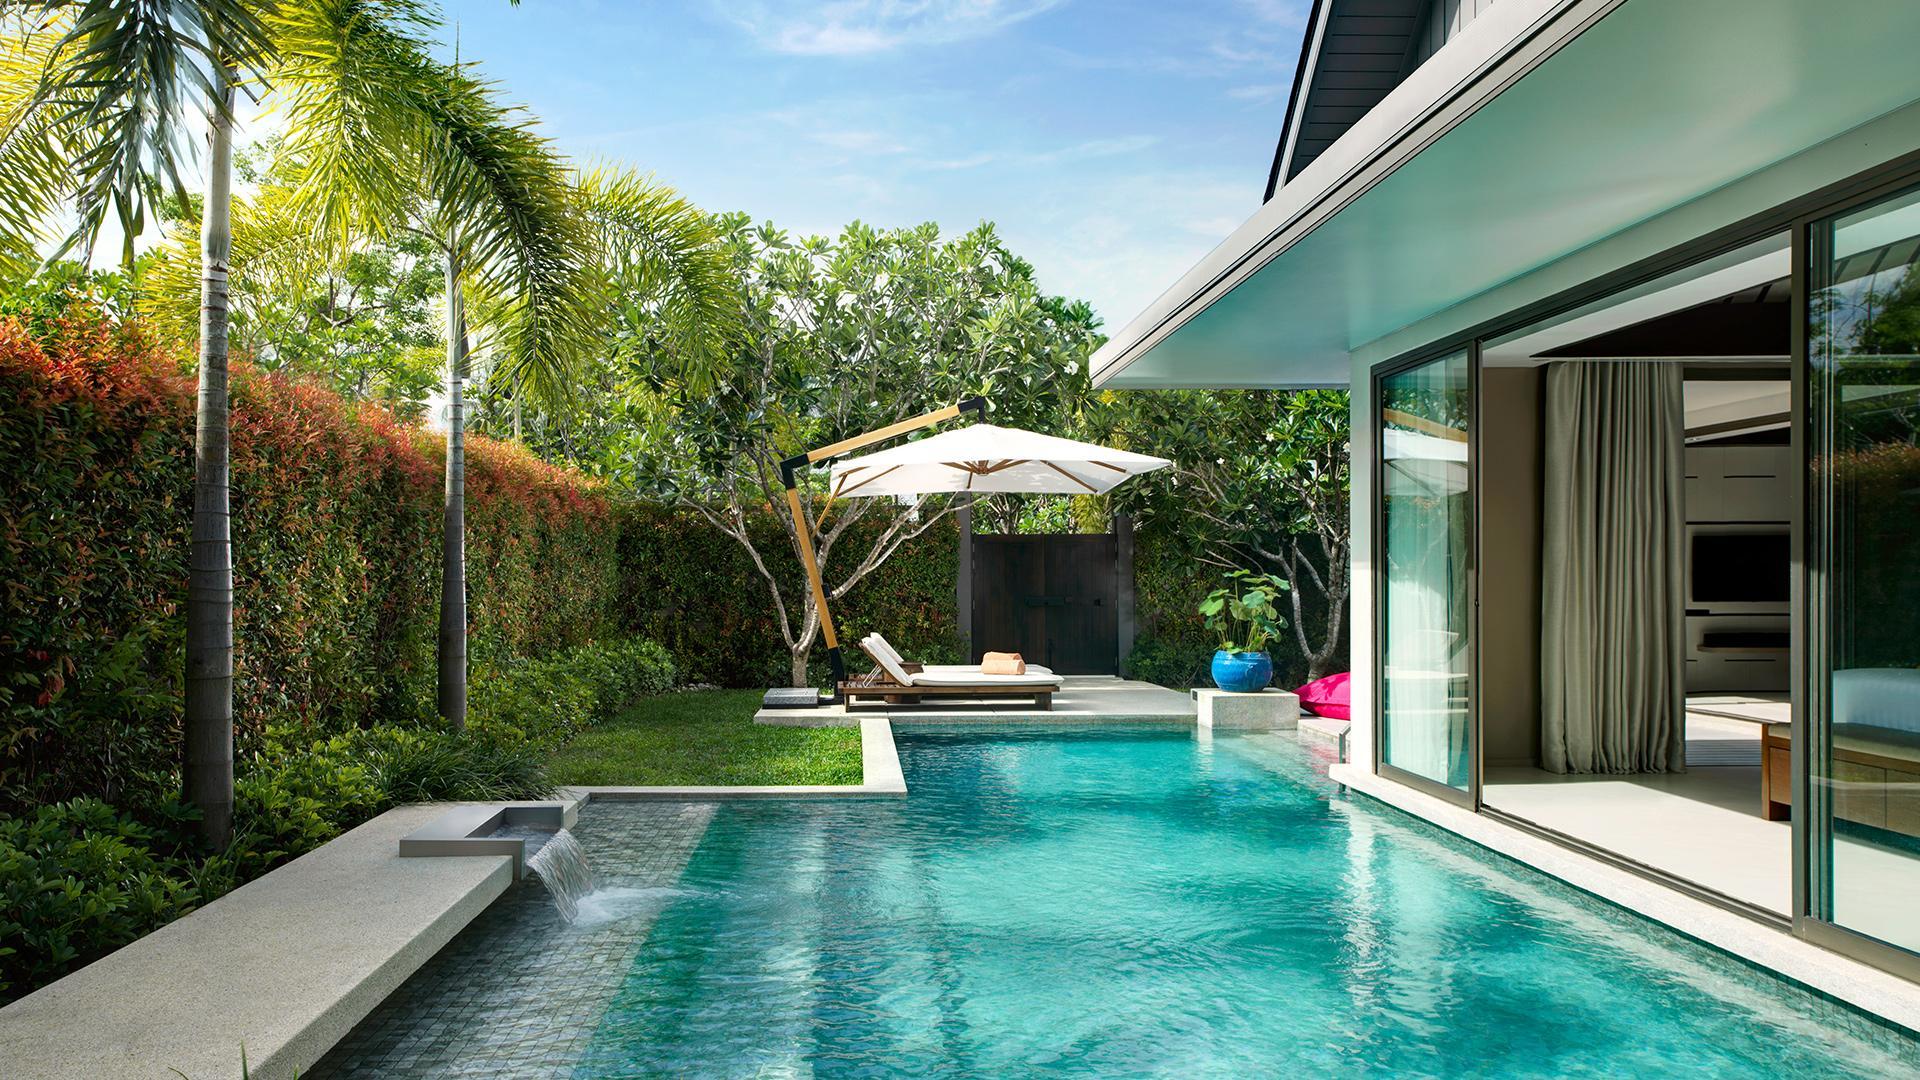 Grand Reserve Pool Villa image 1 at Santiburi Koh Samui Jun 20 by Amphoe Ko Samui, Chang Wat Surat Thani, Thailand